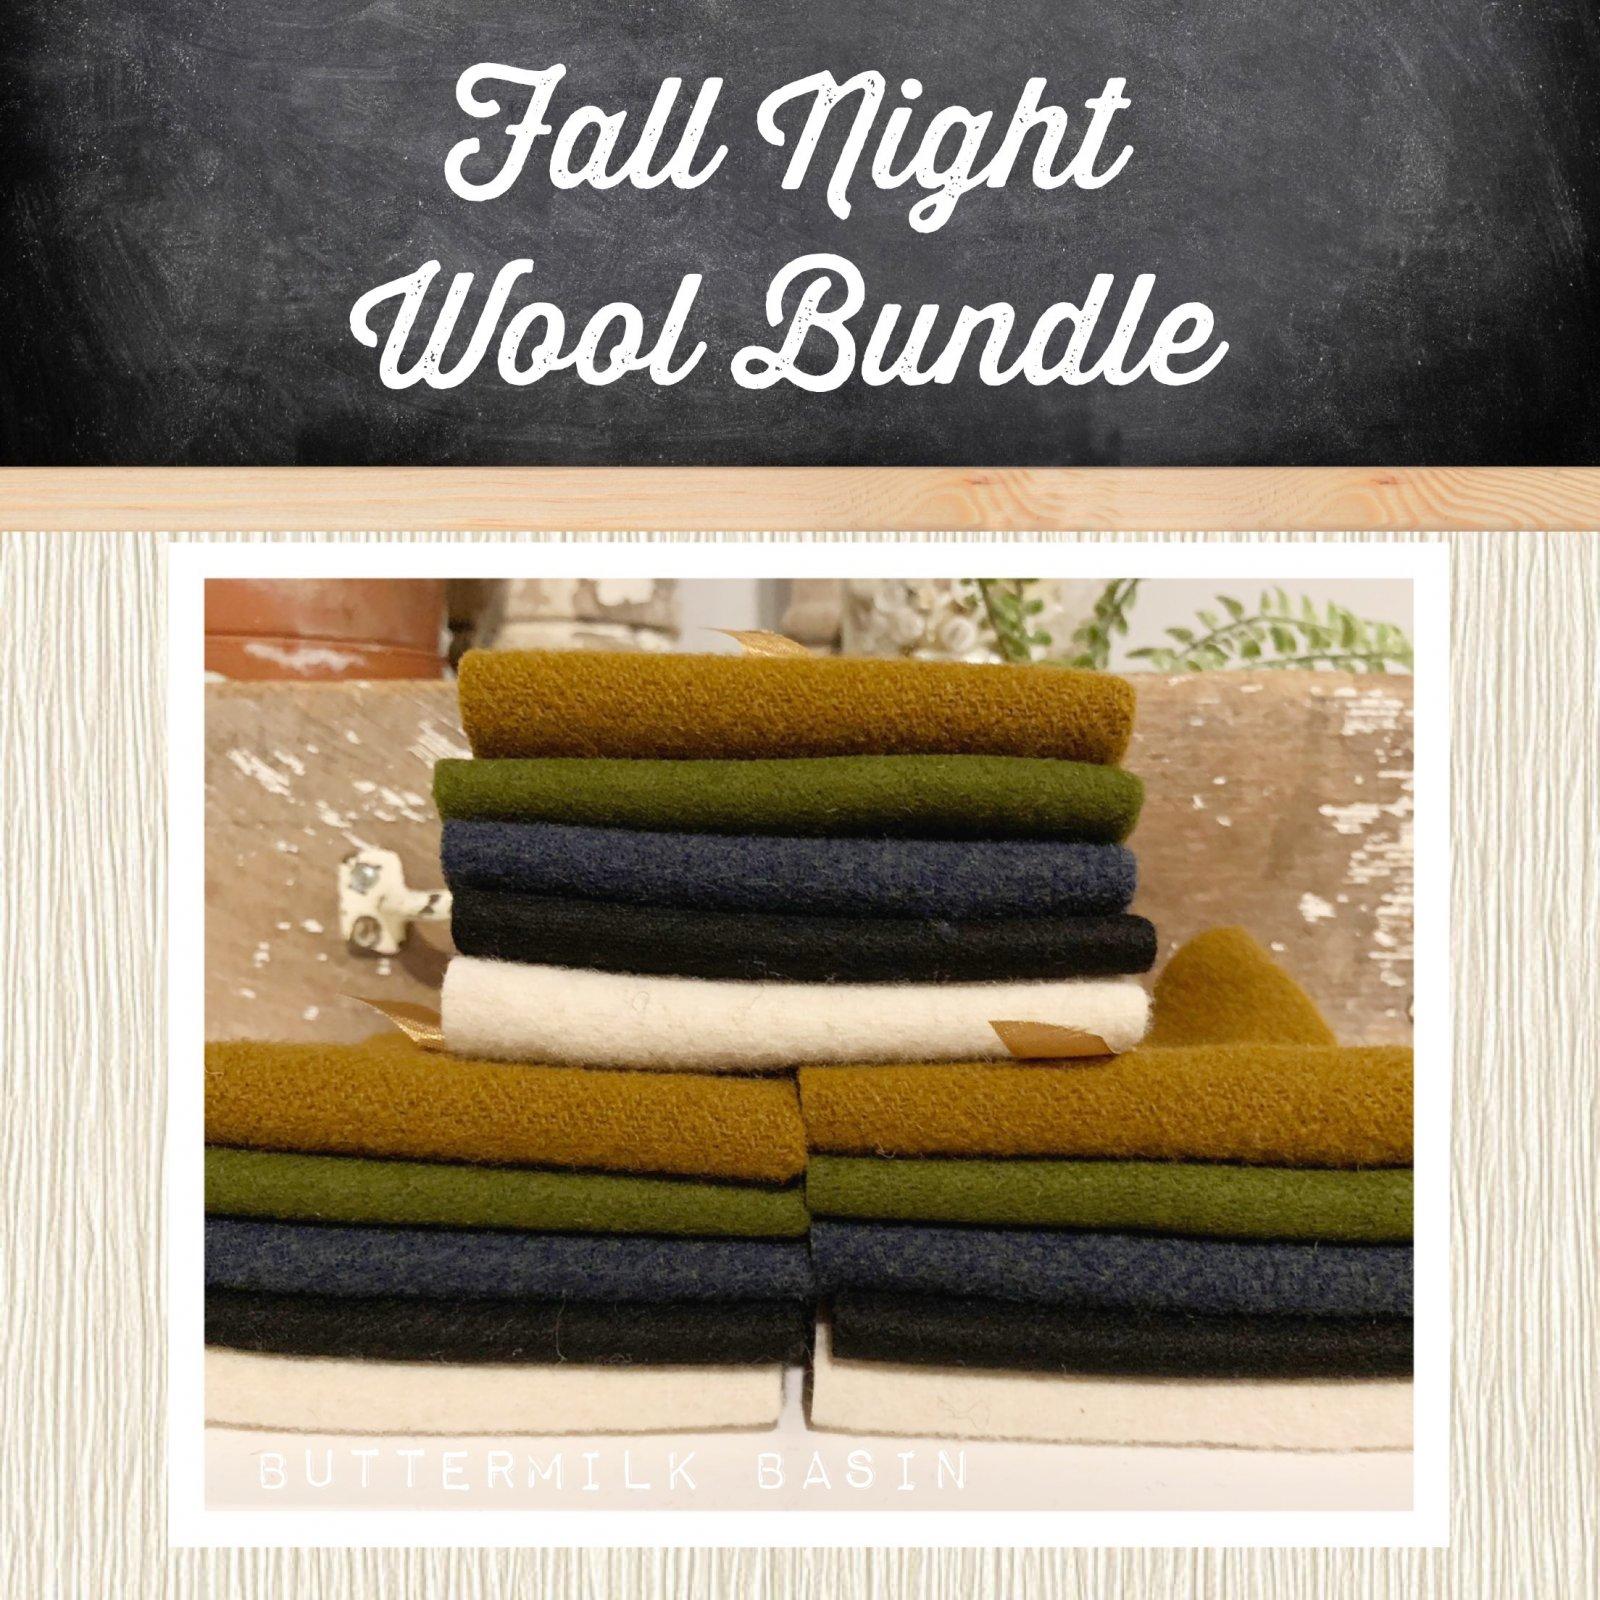 Fall Night Wool Bundle